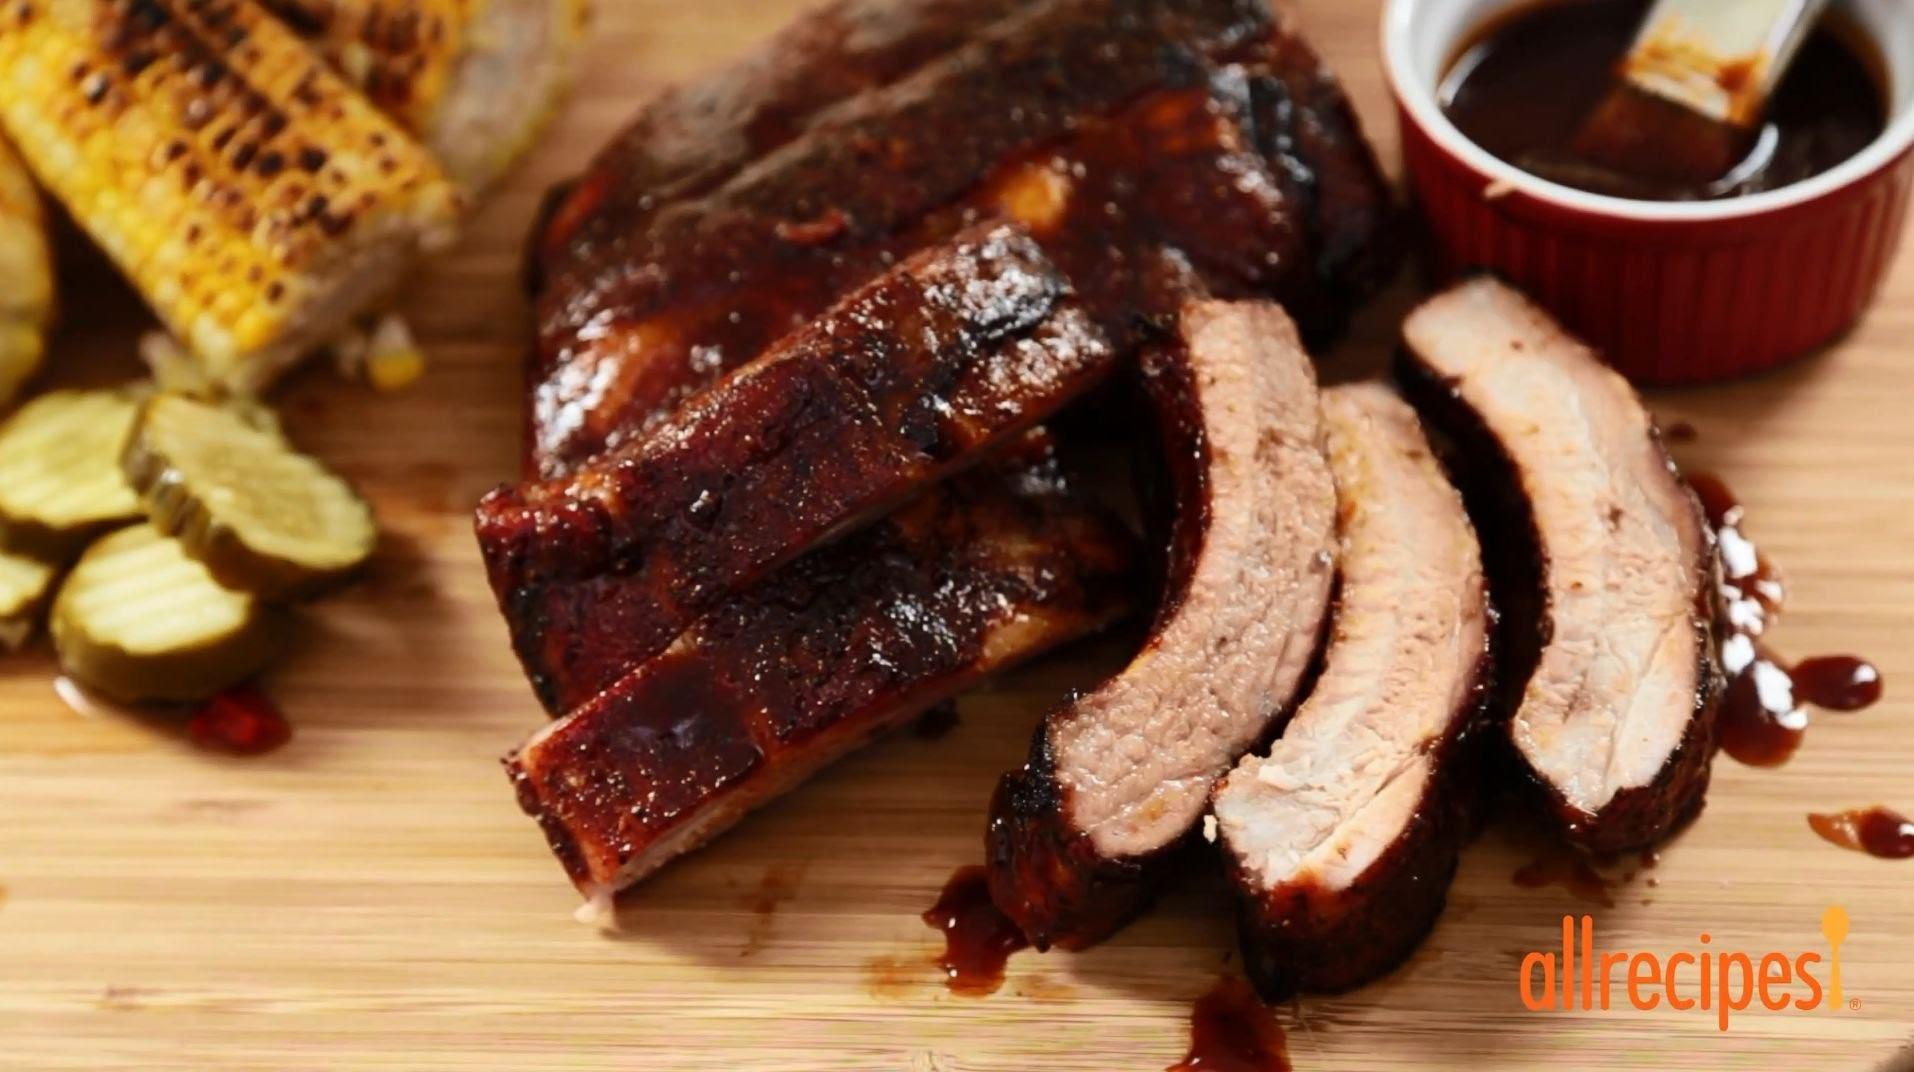 BBQ Recipes - How to Make Kansas City BBQ Ribs